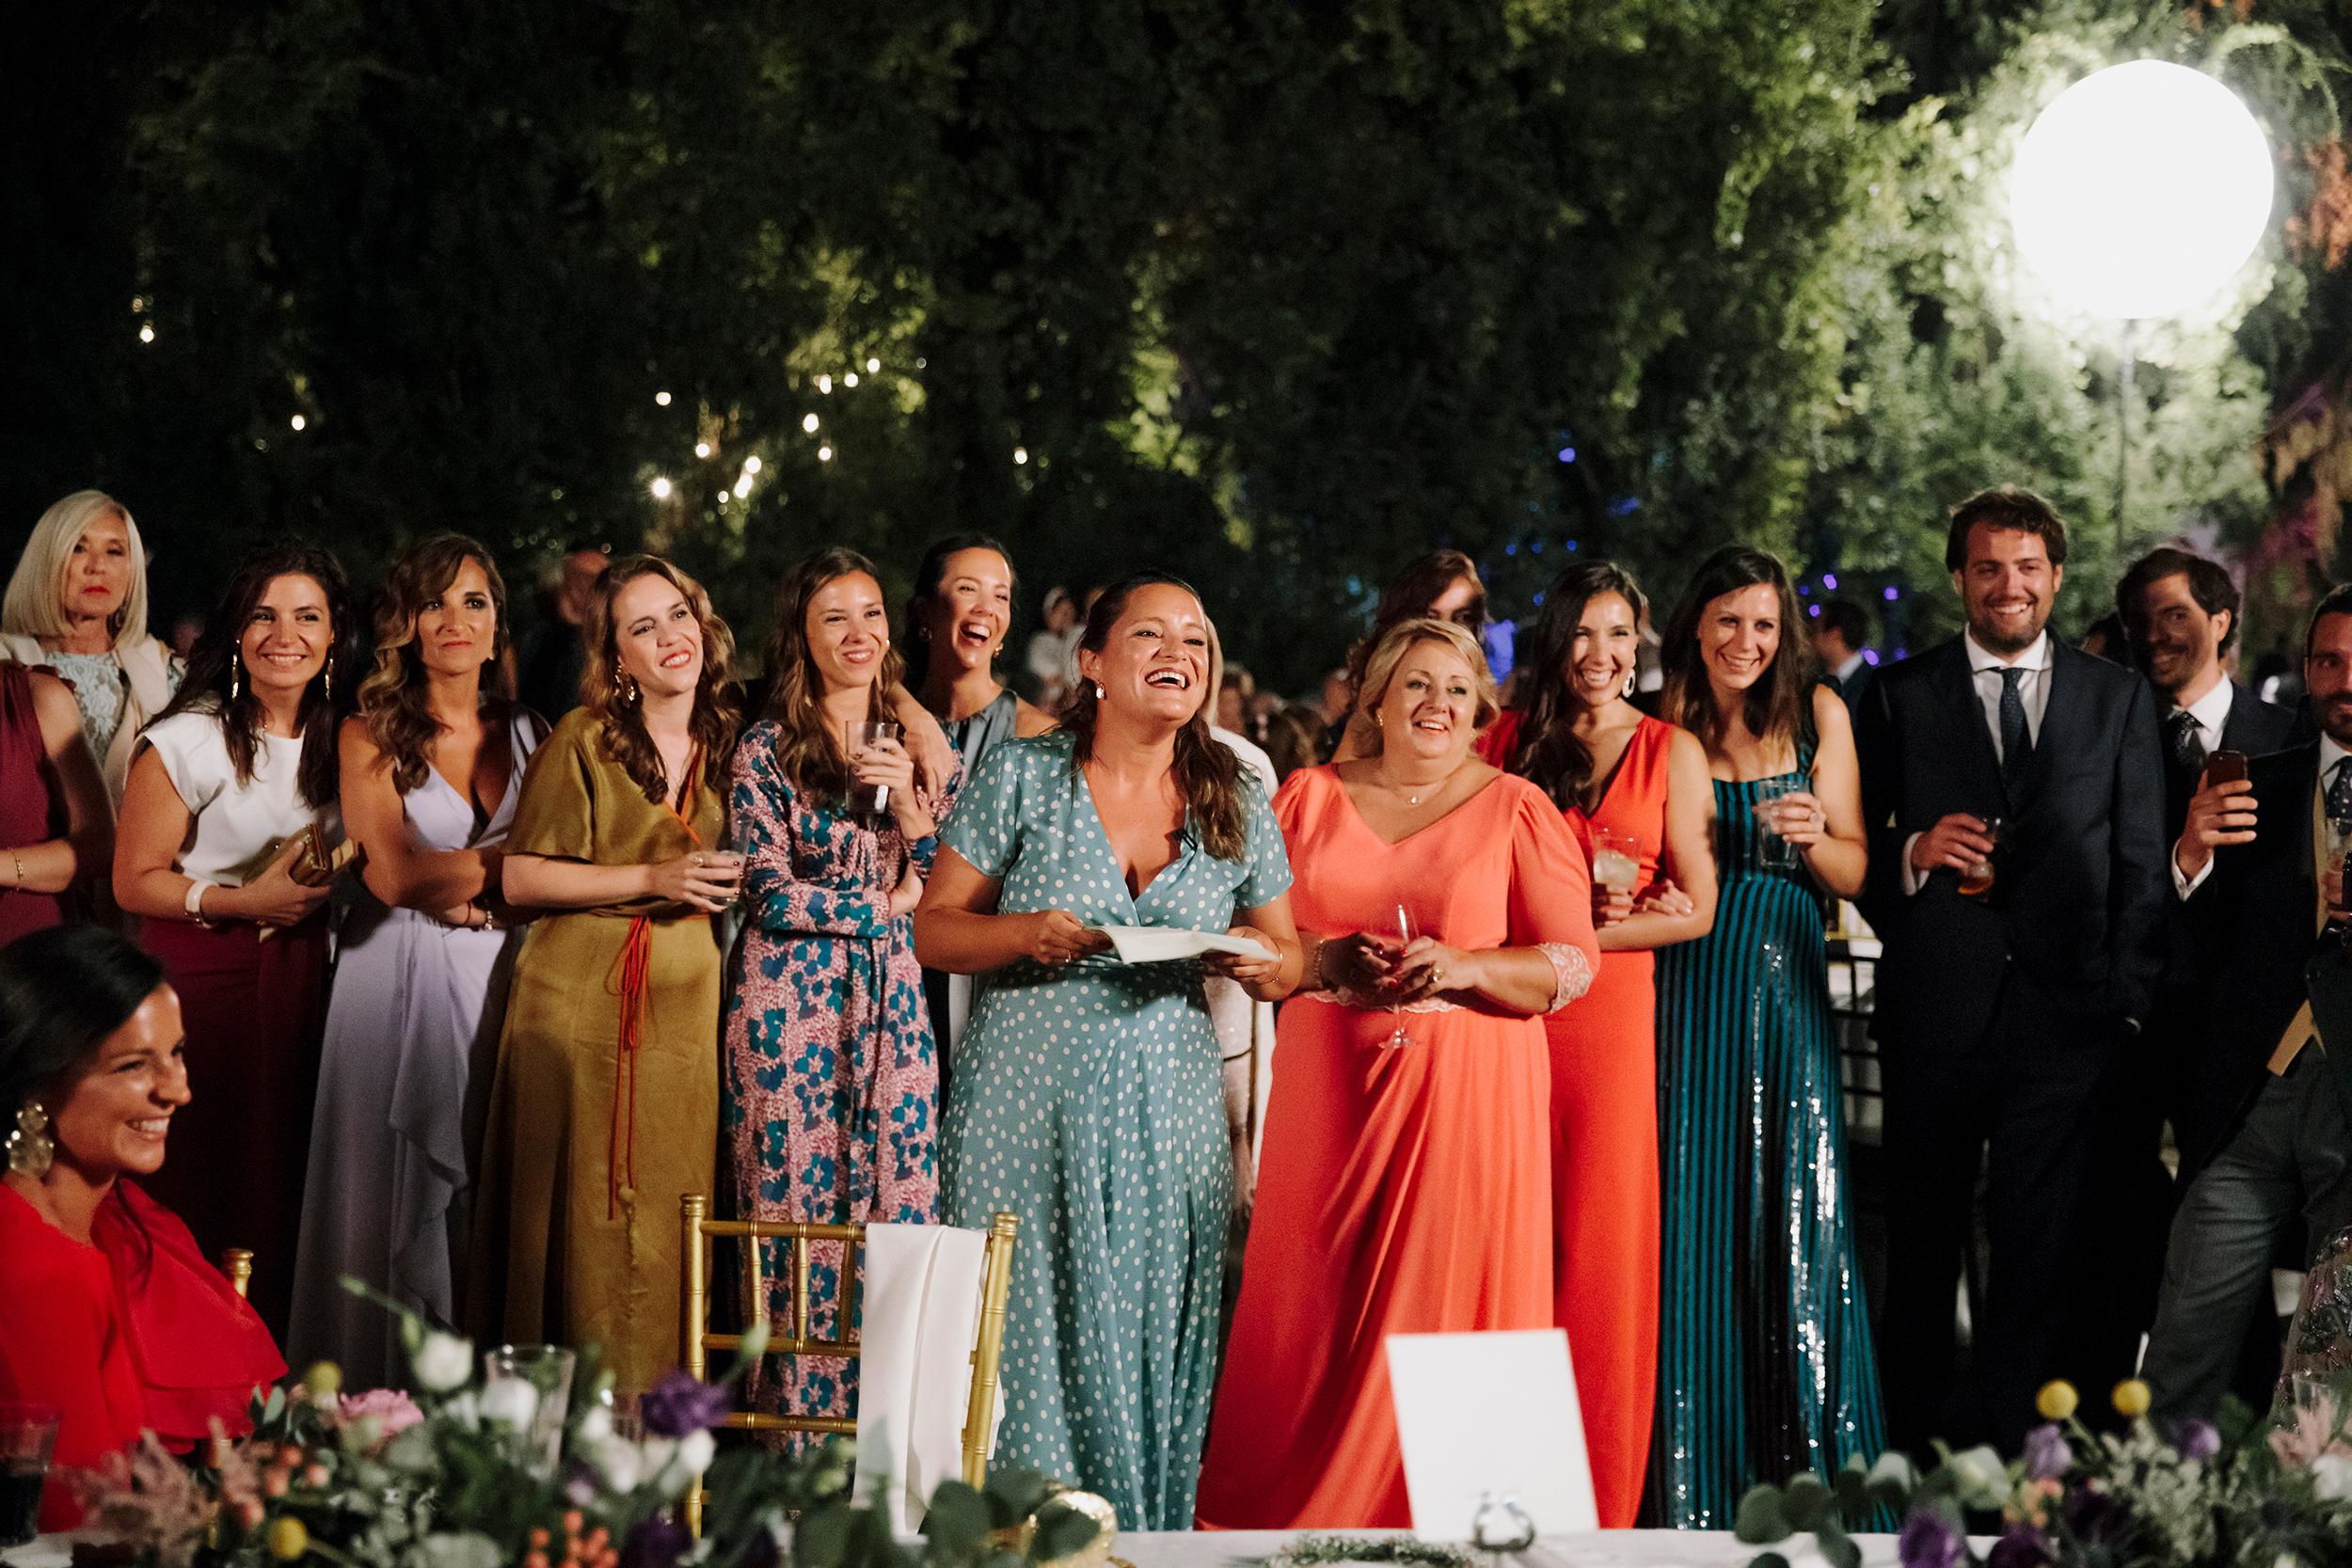 fotografo-bodas-granada-catedral-sagrario-jose-reyes_081.jpg